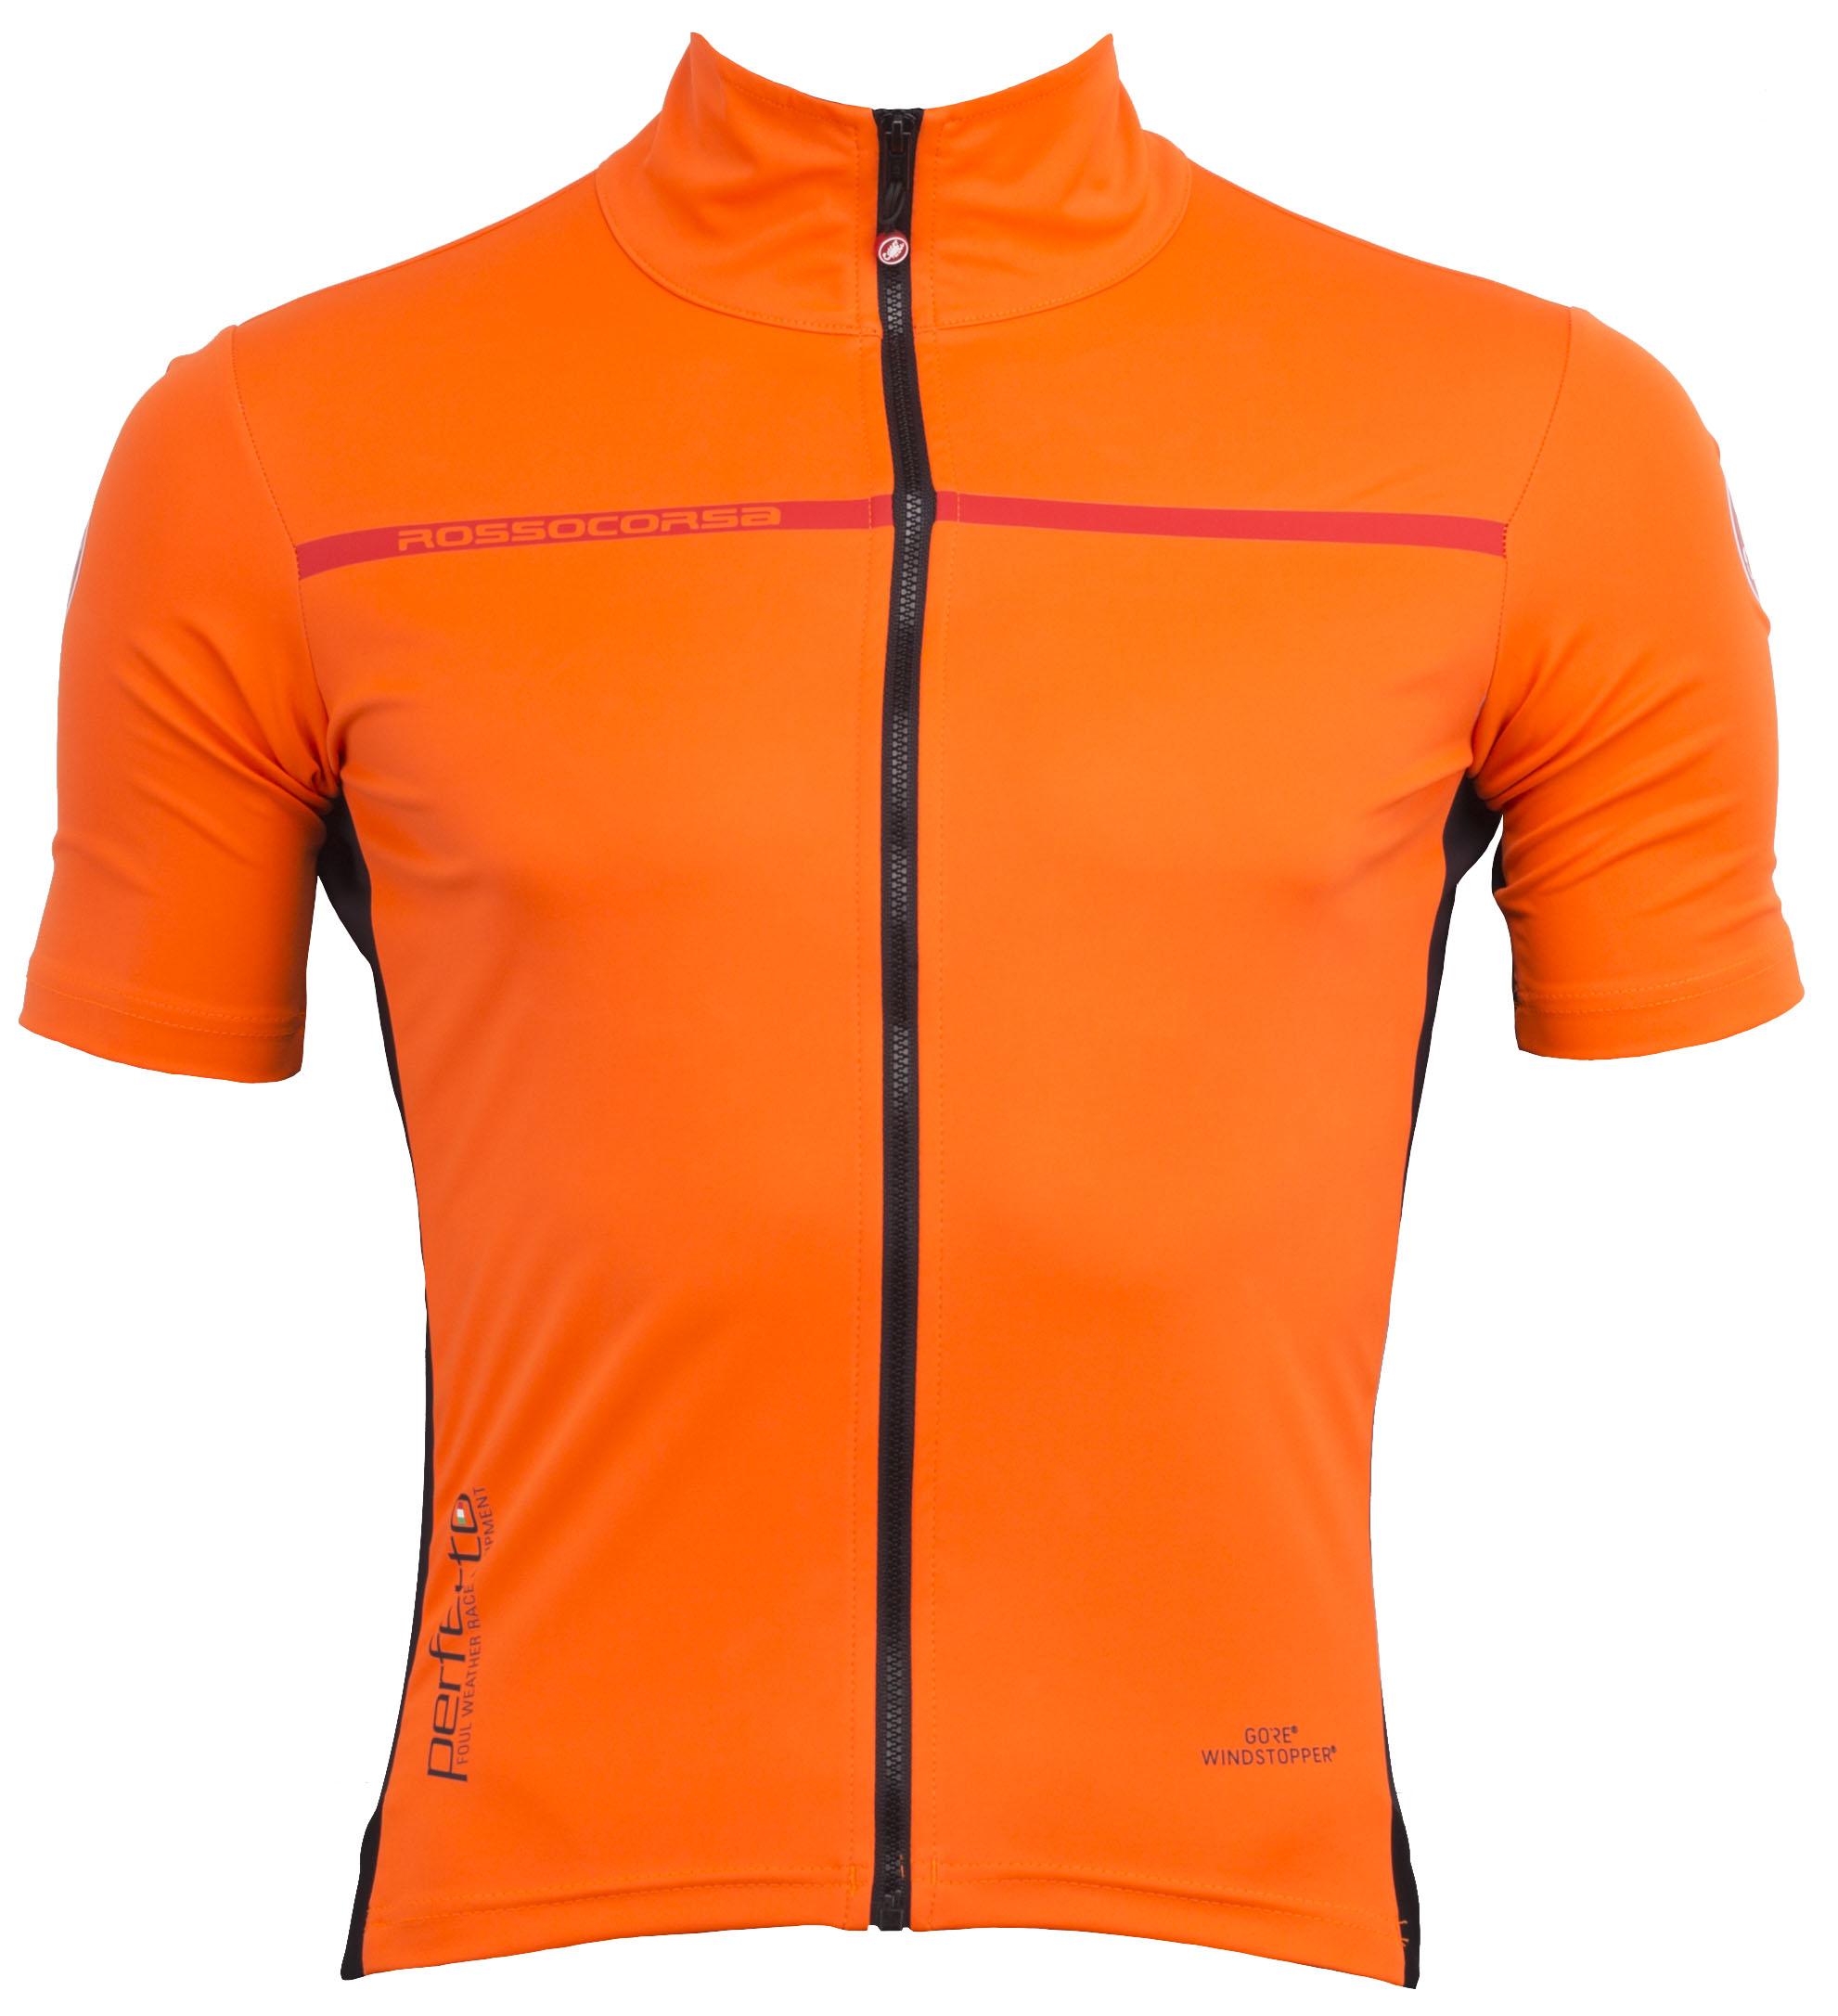 Castelli Perfetto Light 2 Jersey Men's Size Extra Large in Orange